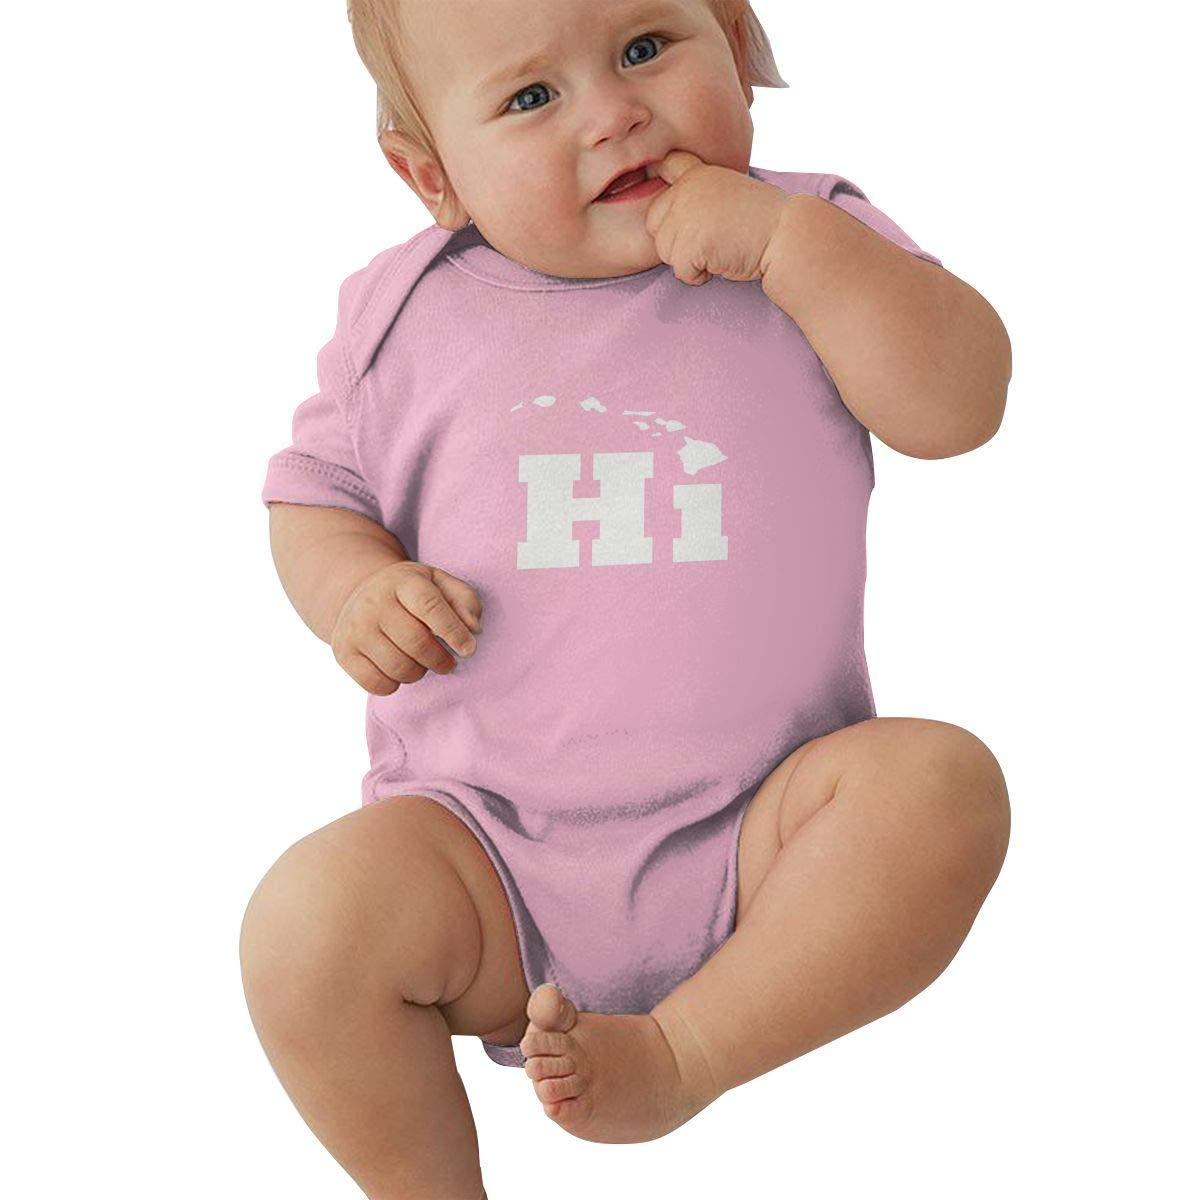 Dfenere Hi with Hawaii Island Logo Graphic Newborn Baby Short Sleeve Bodysuit Romper Infant Summer Clothing Black